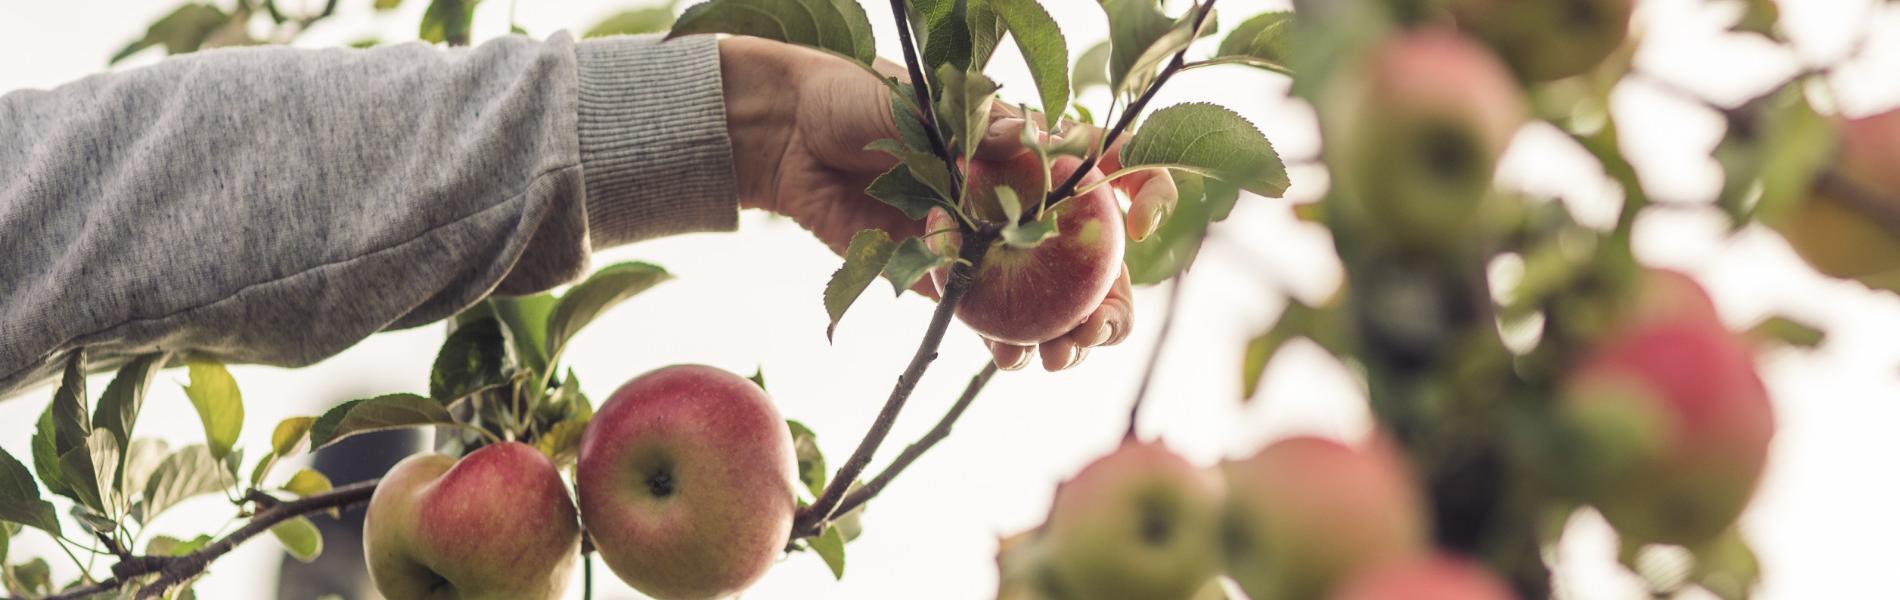 Bodensee-Äpfel